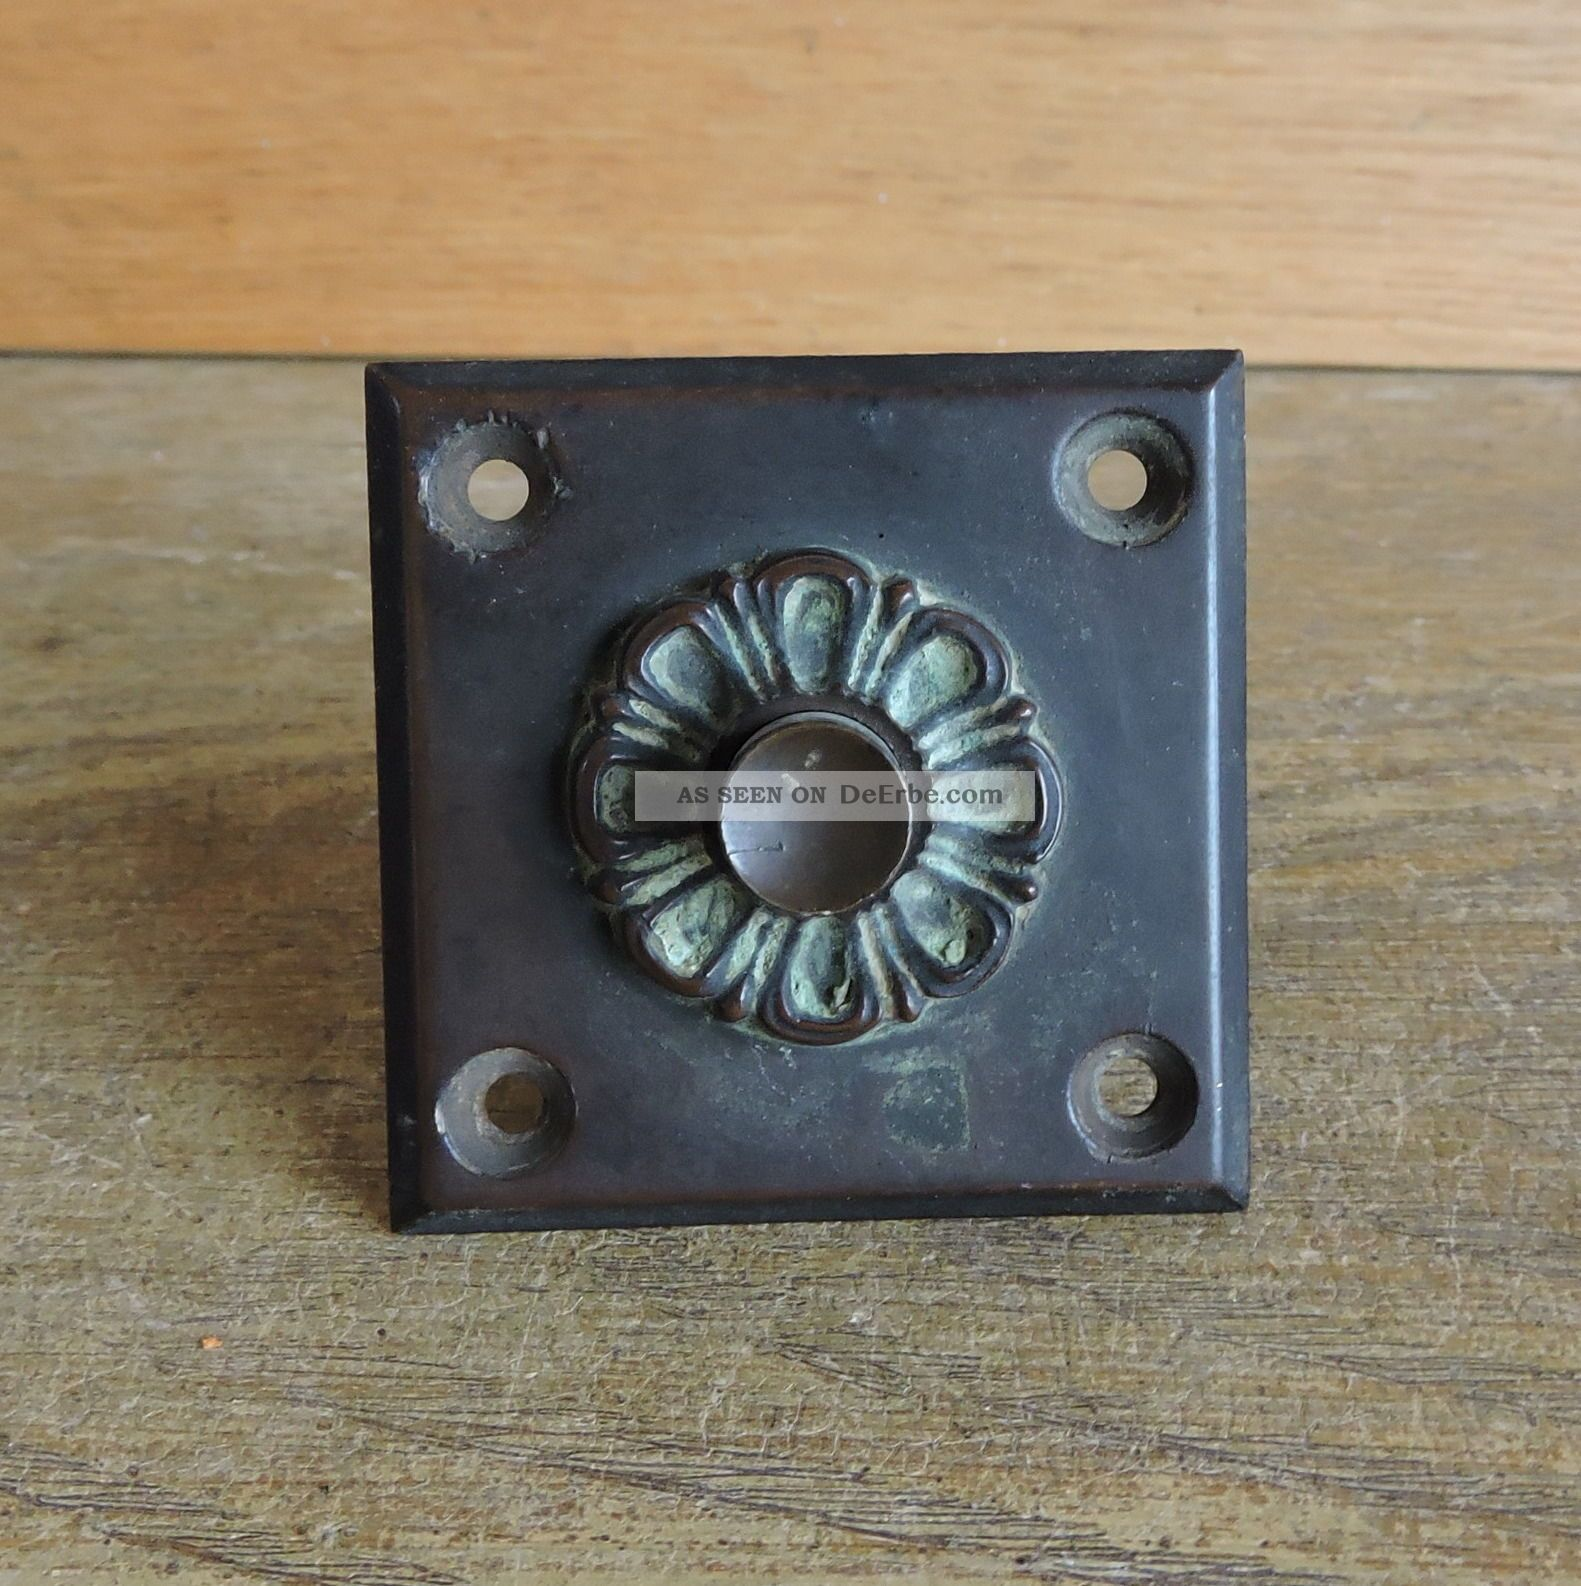 Alt Klingeltaster Hausklingel Schalter Glockentaster Messing? Metall 1900 Original, vor 1960 gefertigt Bild